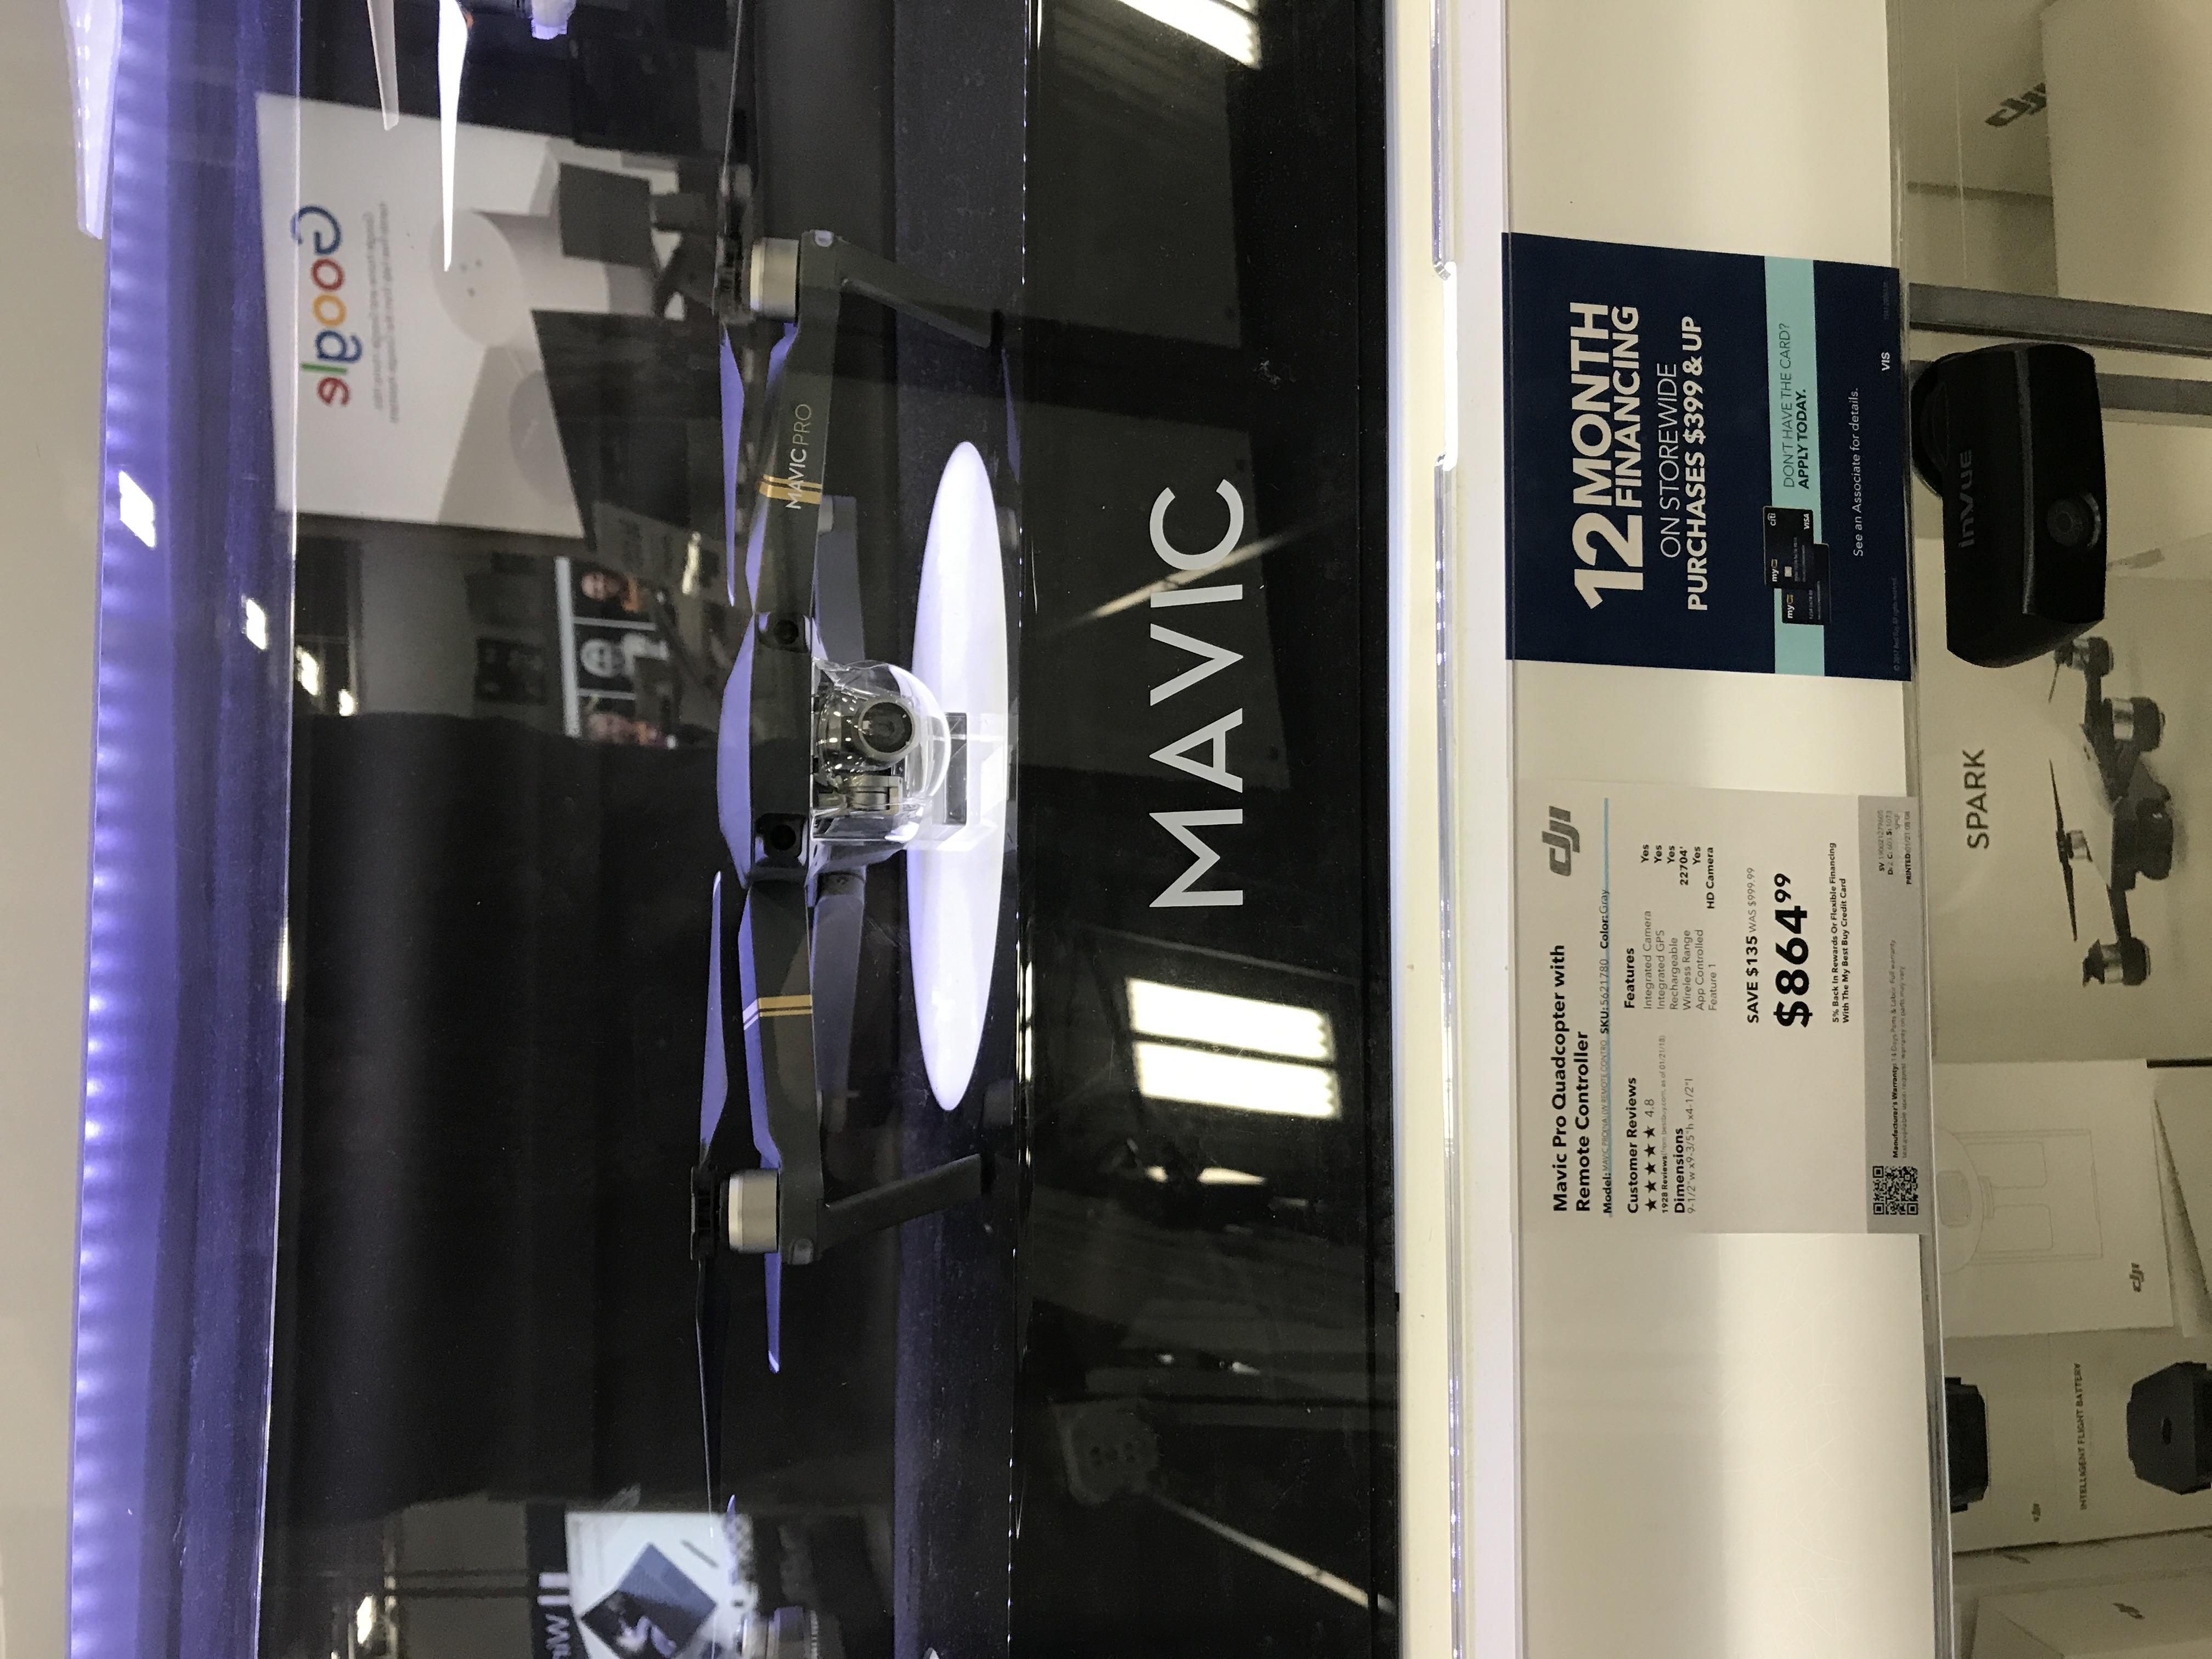 Mavic Pro (Standard Bundle) ymmv $864.99